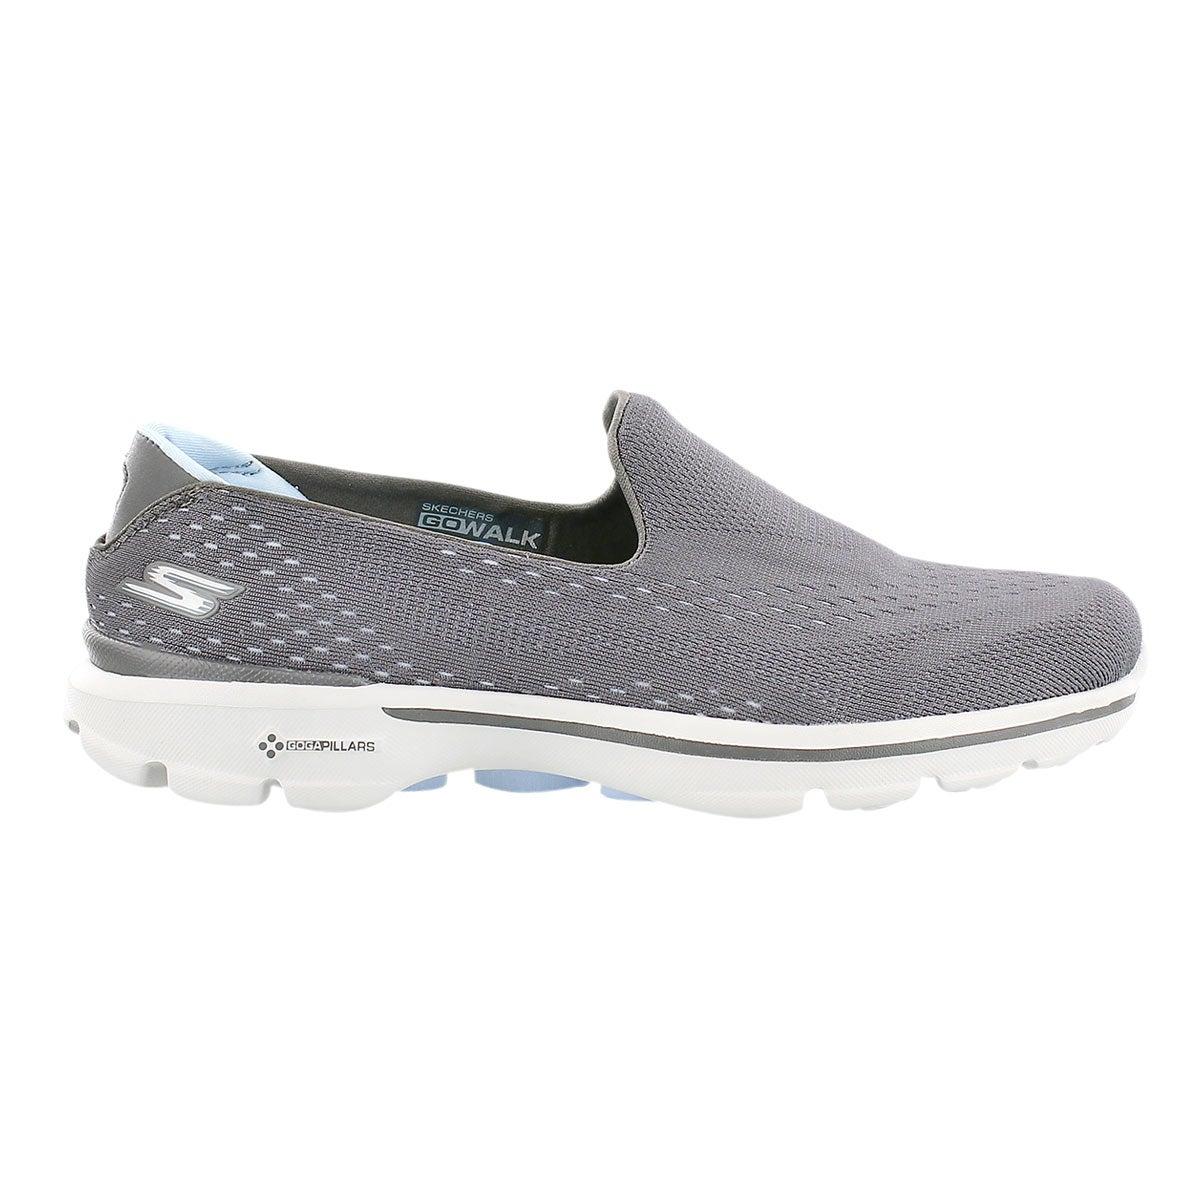 Flâneur GOwalk 3, gris/bleu, femmes